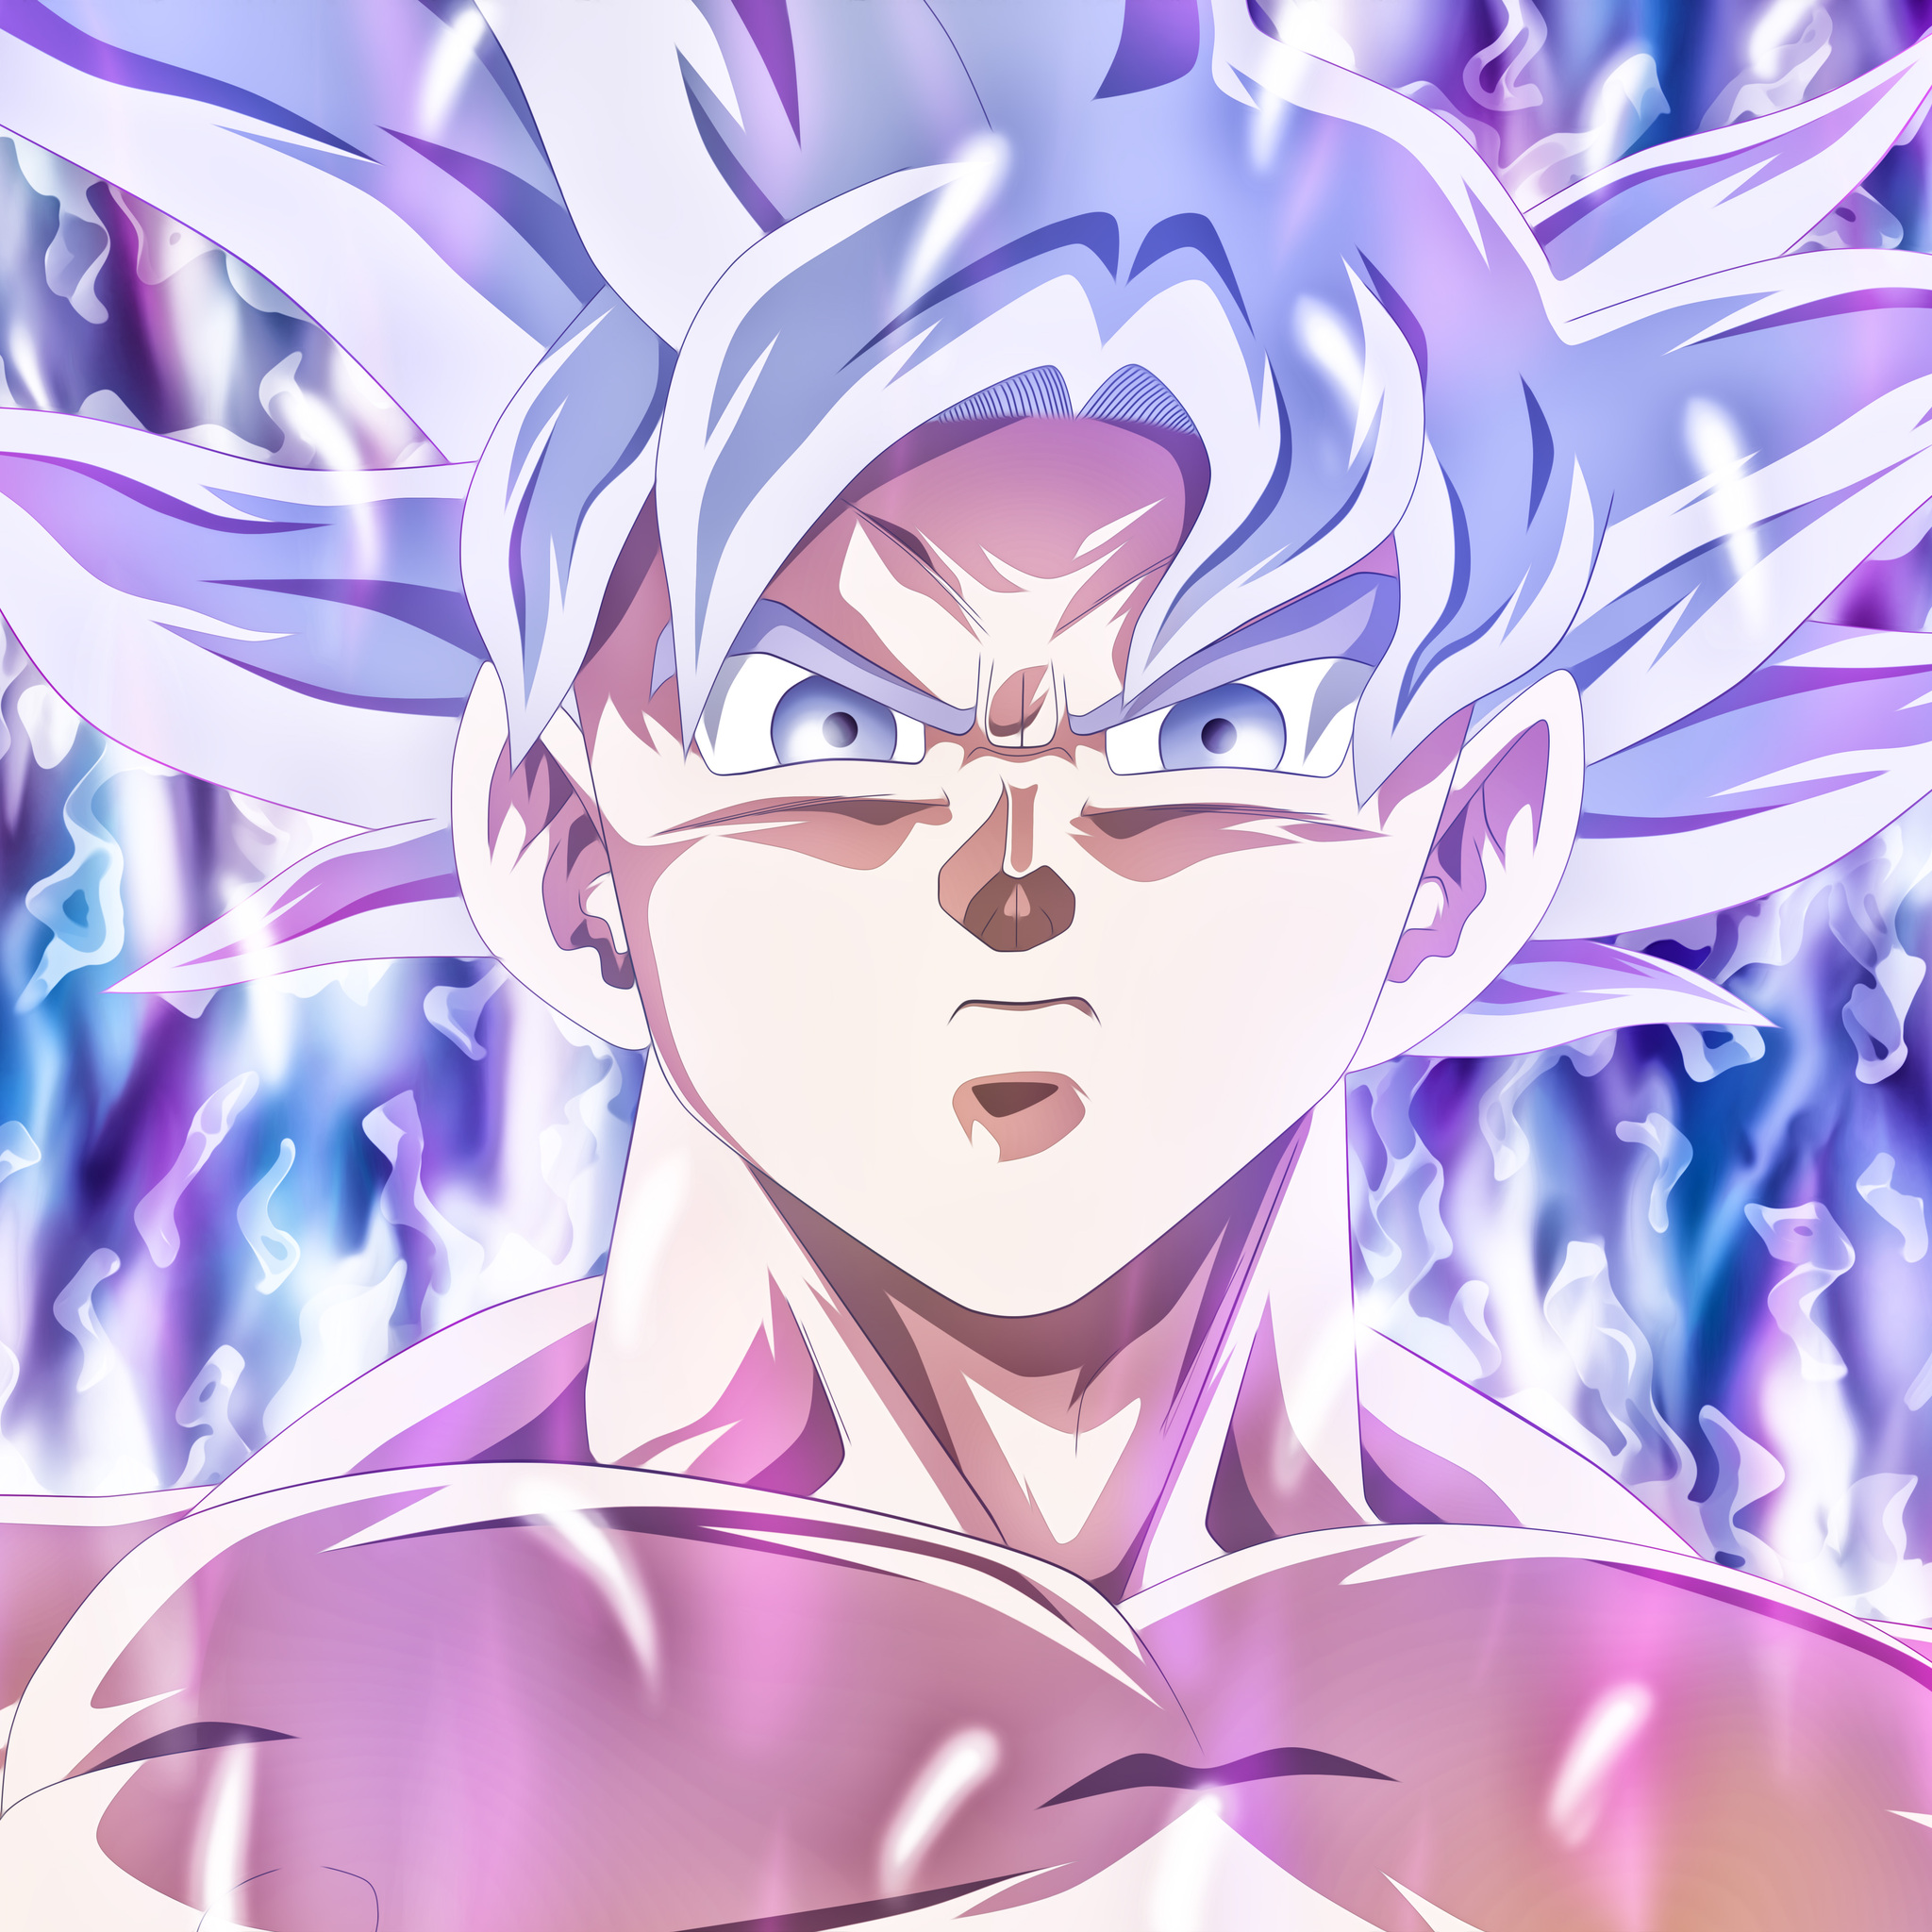 2048x2048 Goku Mastered Ultra Instinct Ipad Air Hd 4k Wallpapers